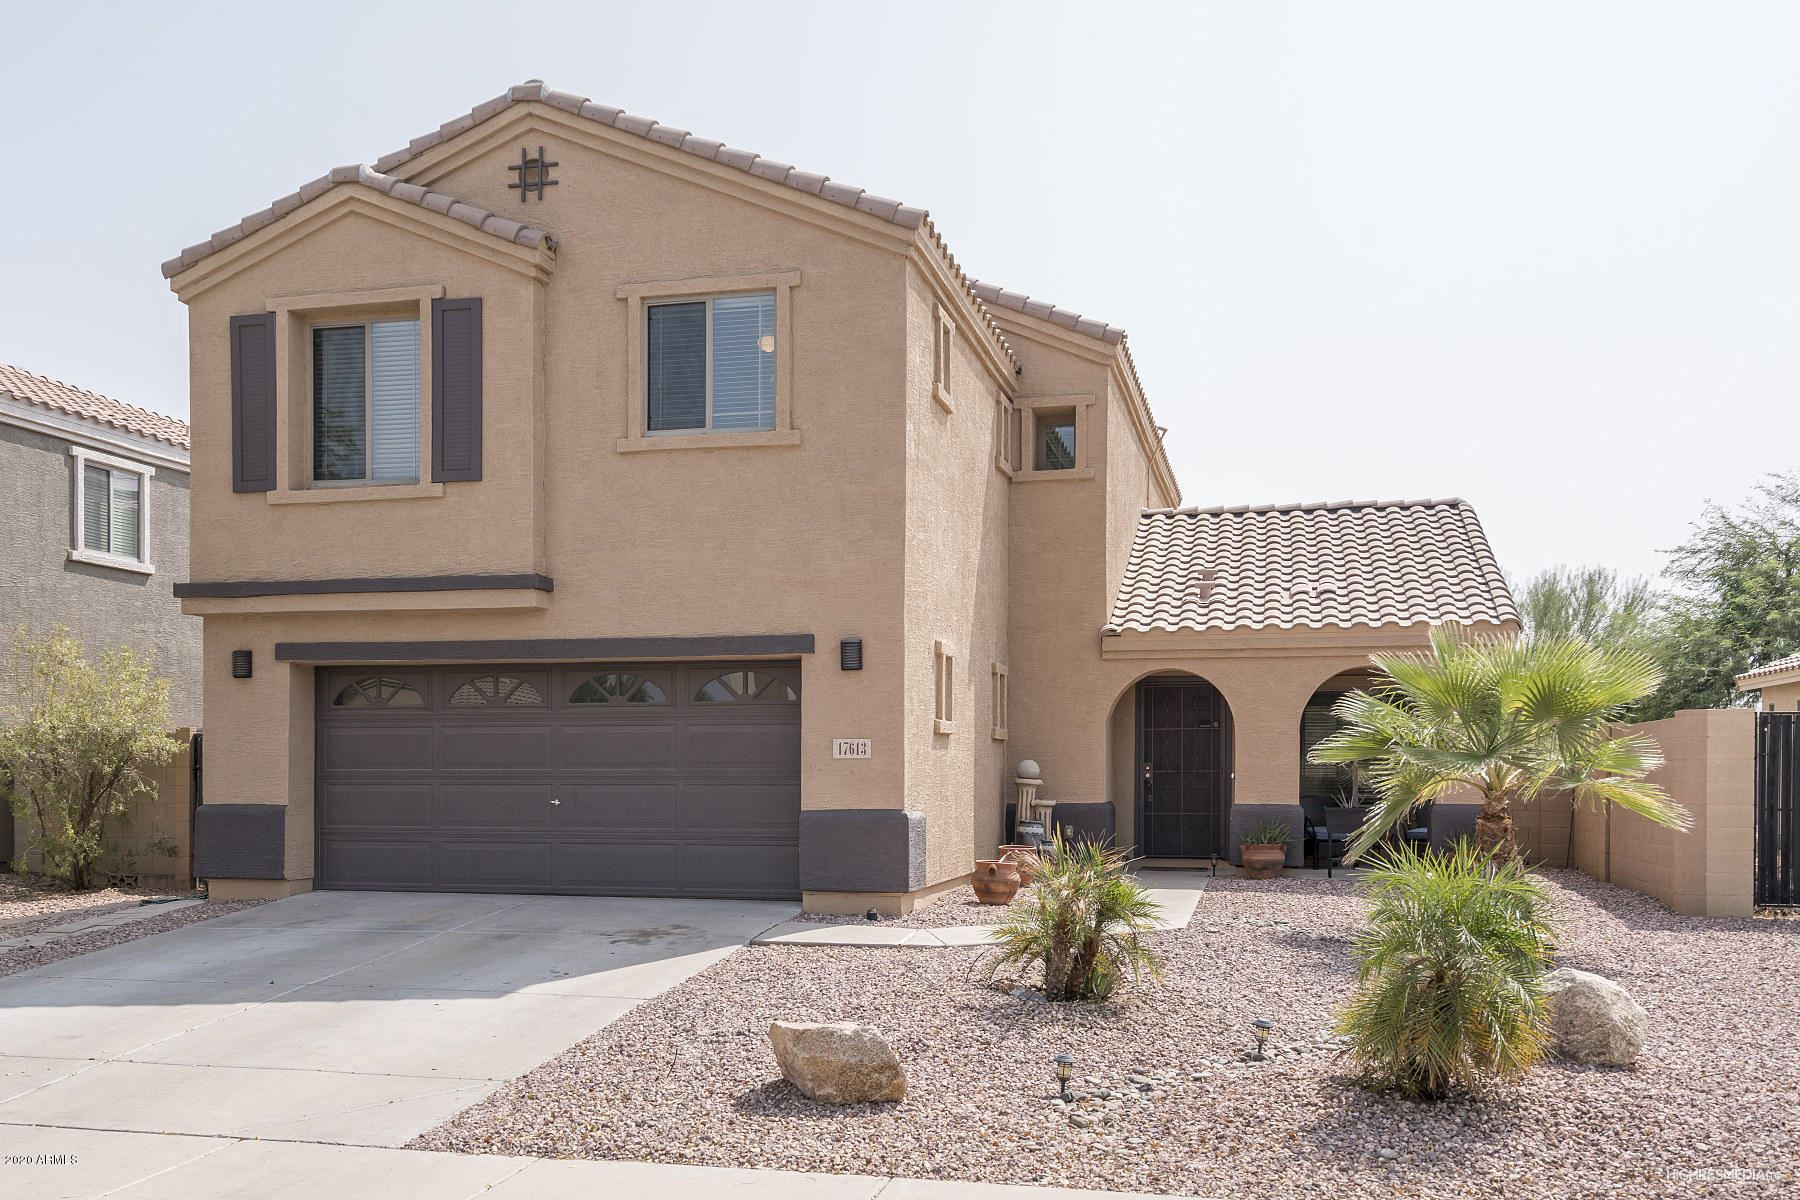 17613 W VENTURA Street, Surprise, AZ 85388 - MLS#: 6135732